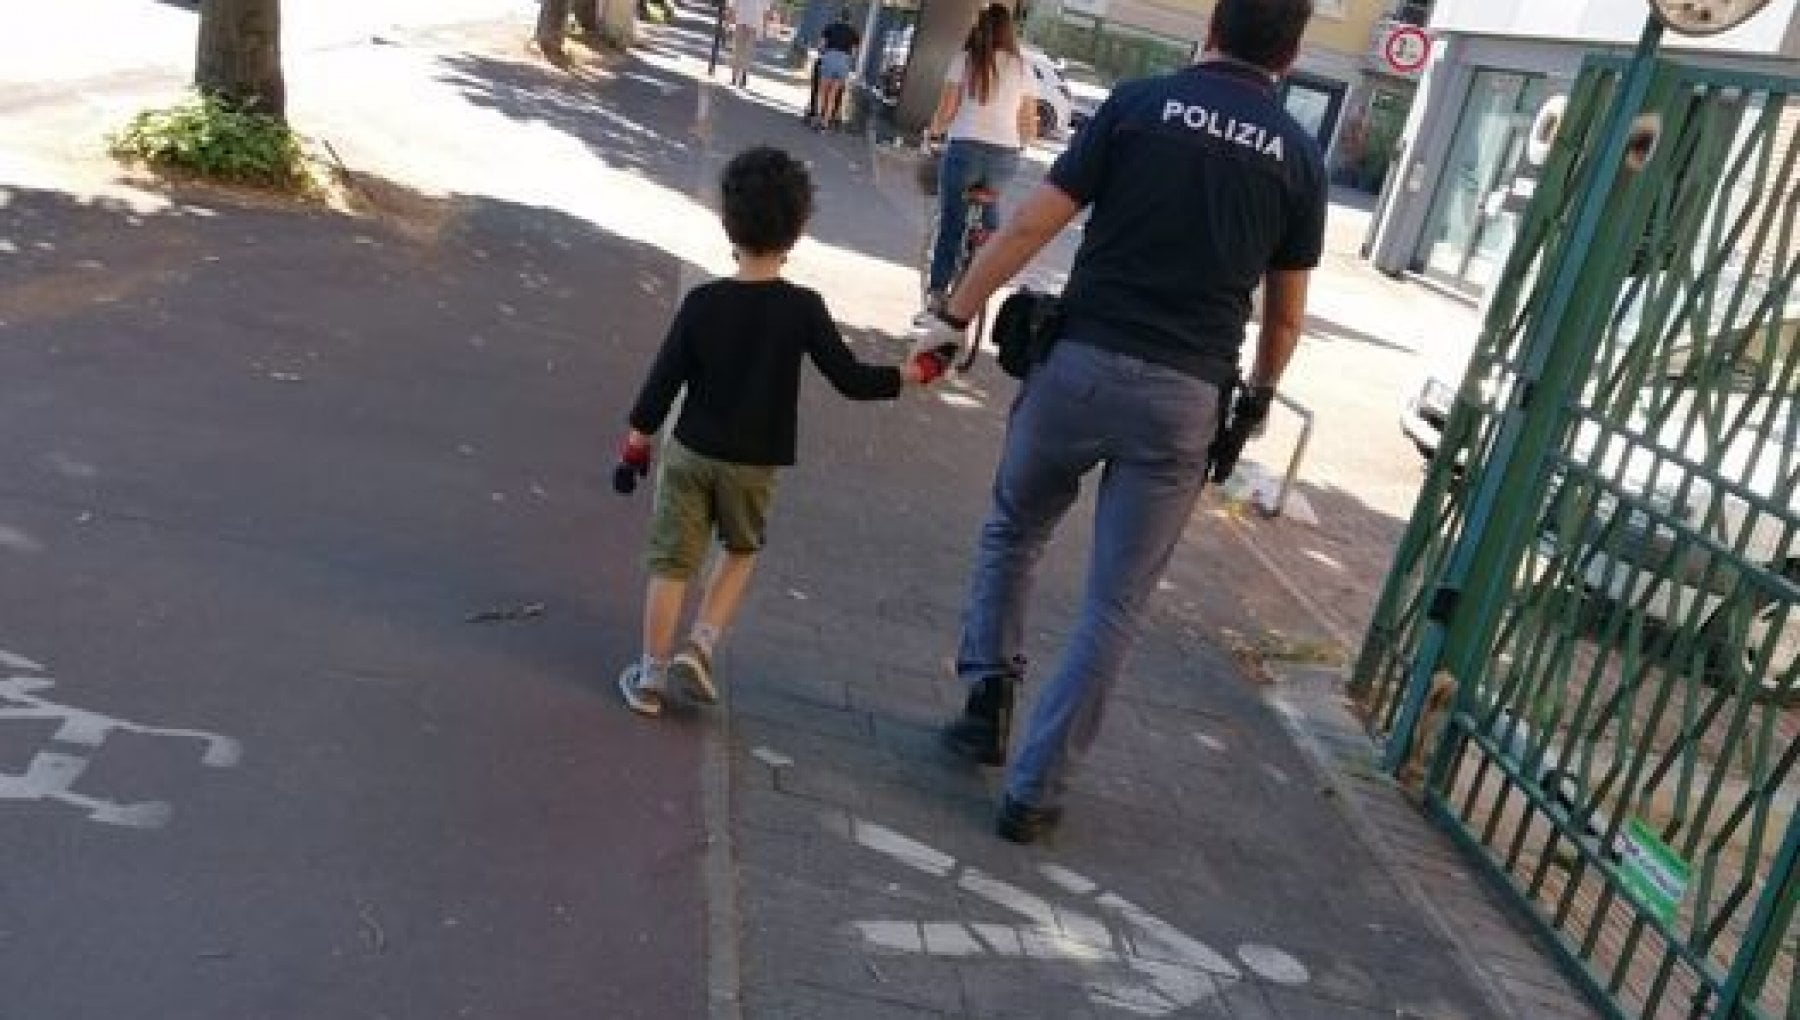 parma-bimba-per-strada-polizia